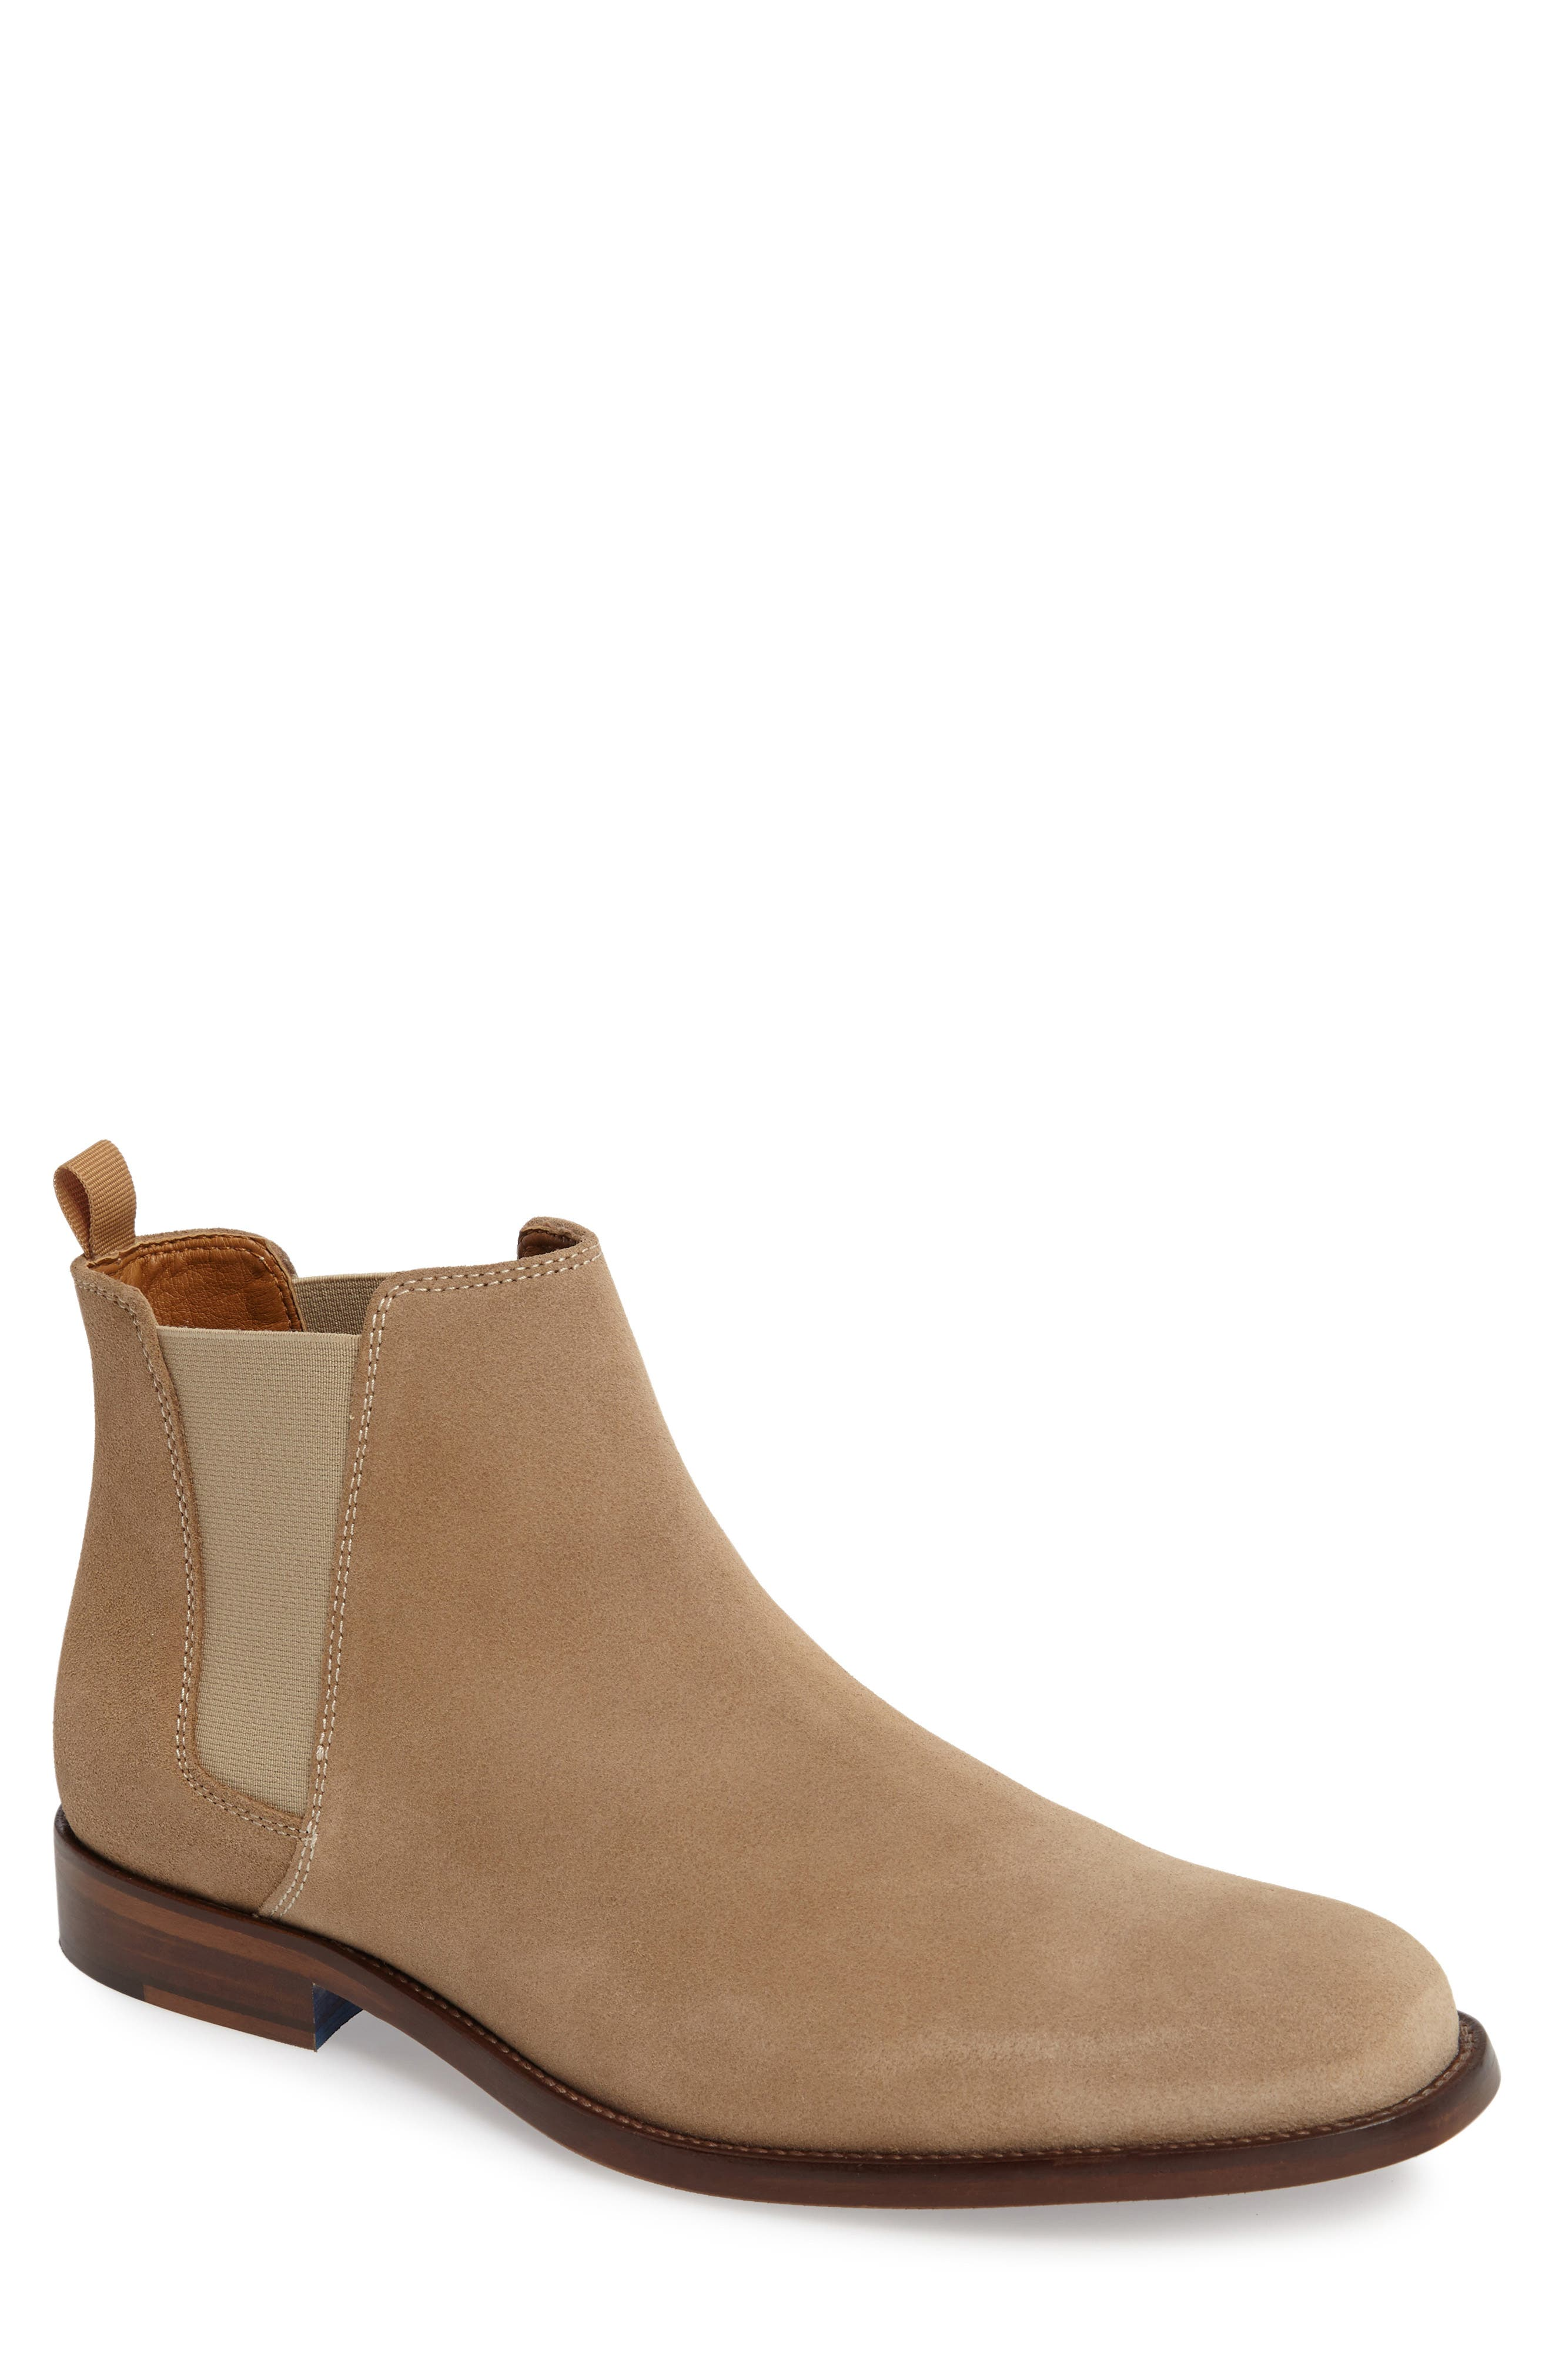 Vianello Chelsea Boot,                         Main,                         color, Beige Suede